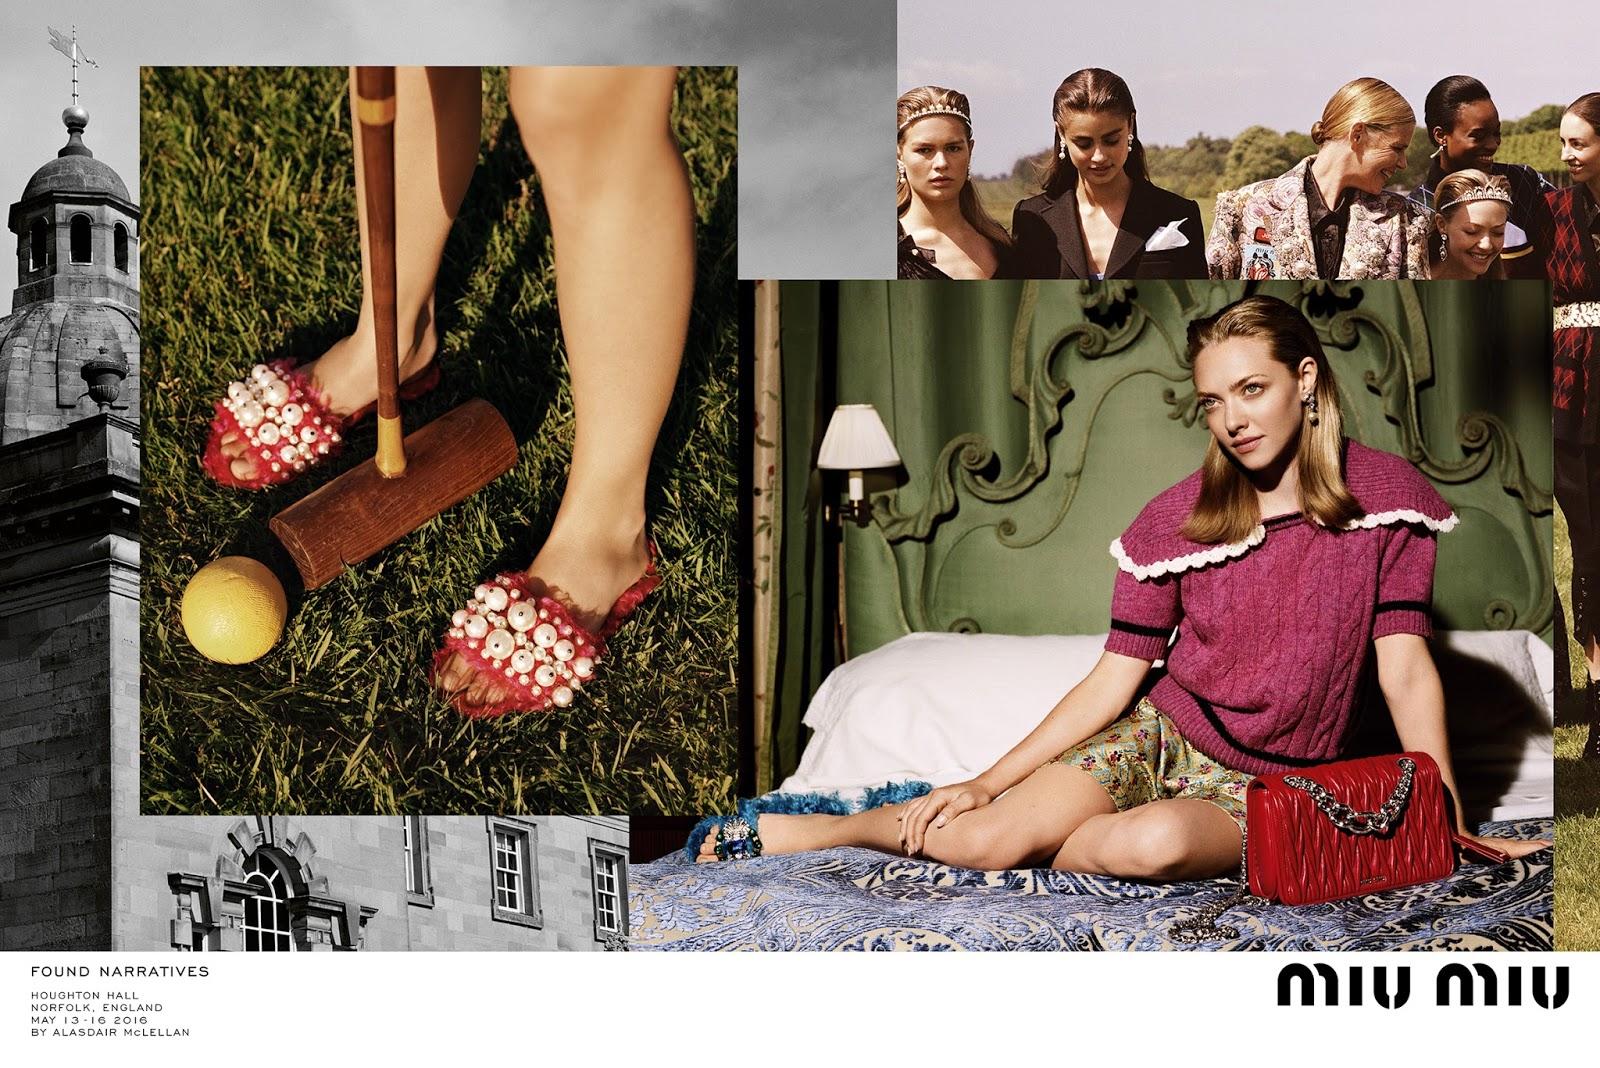 Eniwhere Fashion - Amanda Seyfried - Miu Miu